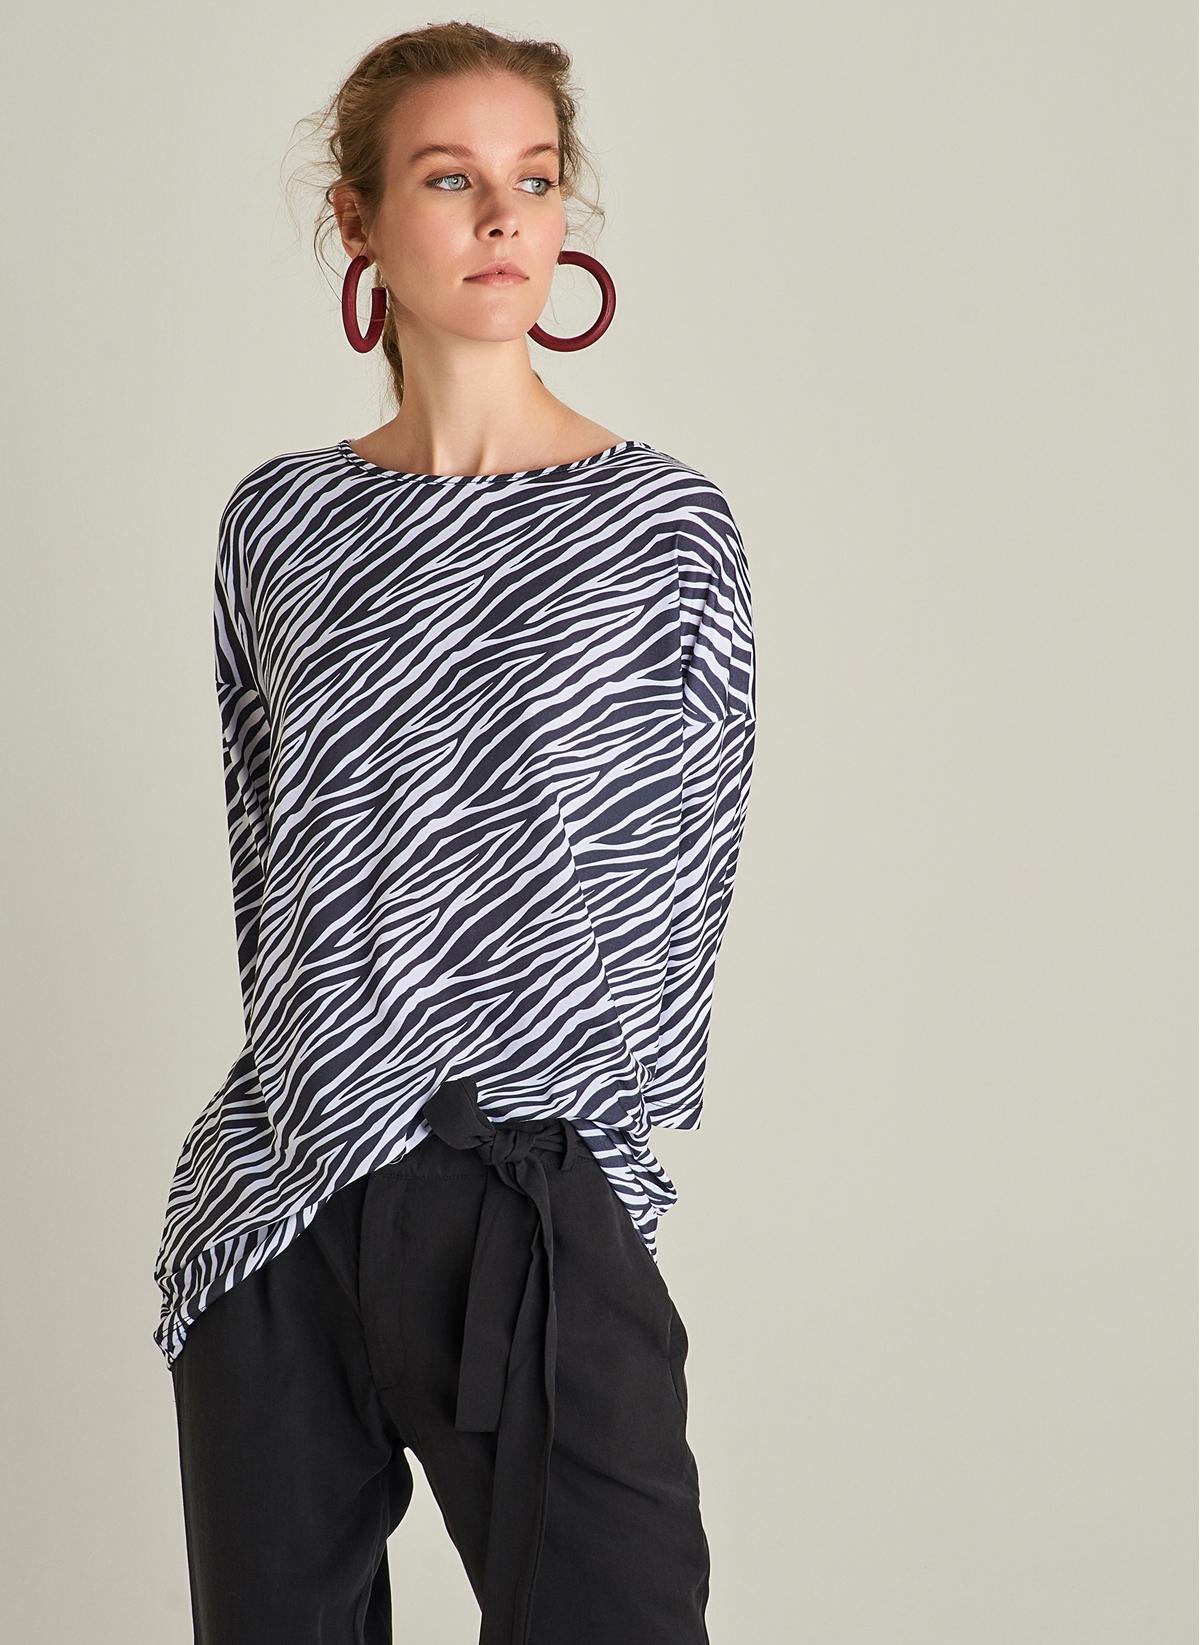 fa86a27a95295 Ng Style Kadın Zebra Desenli Tunik Tişört Beyaz - Glami.com.tr